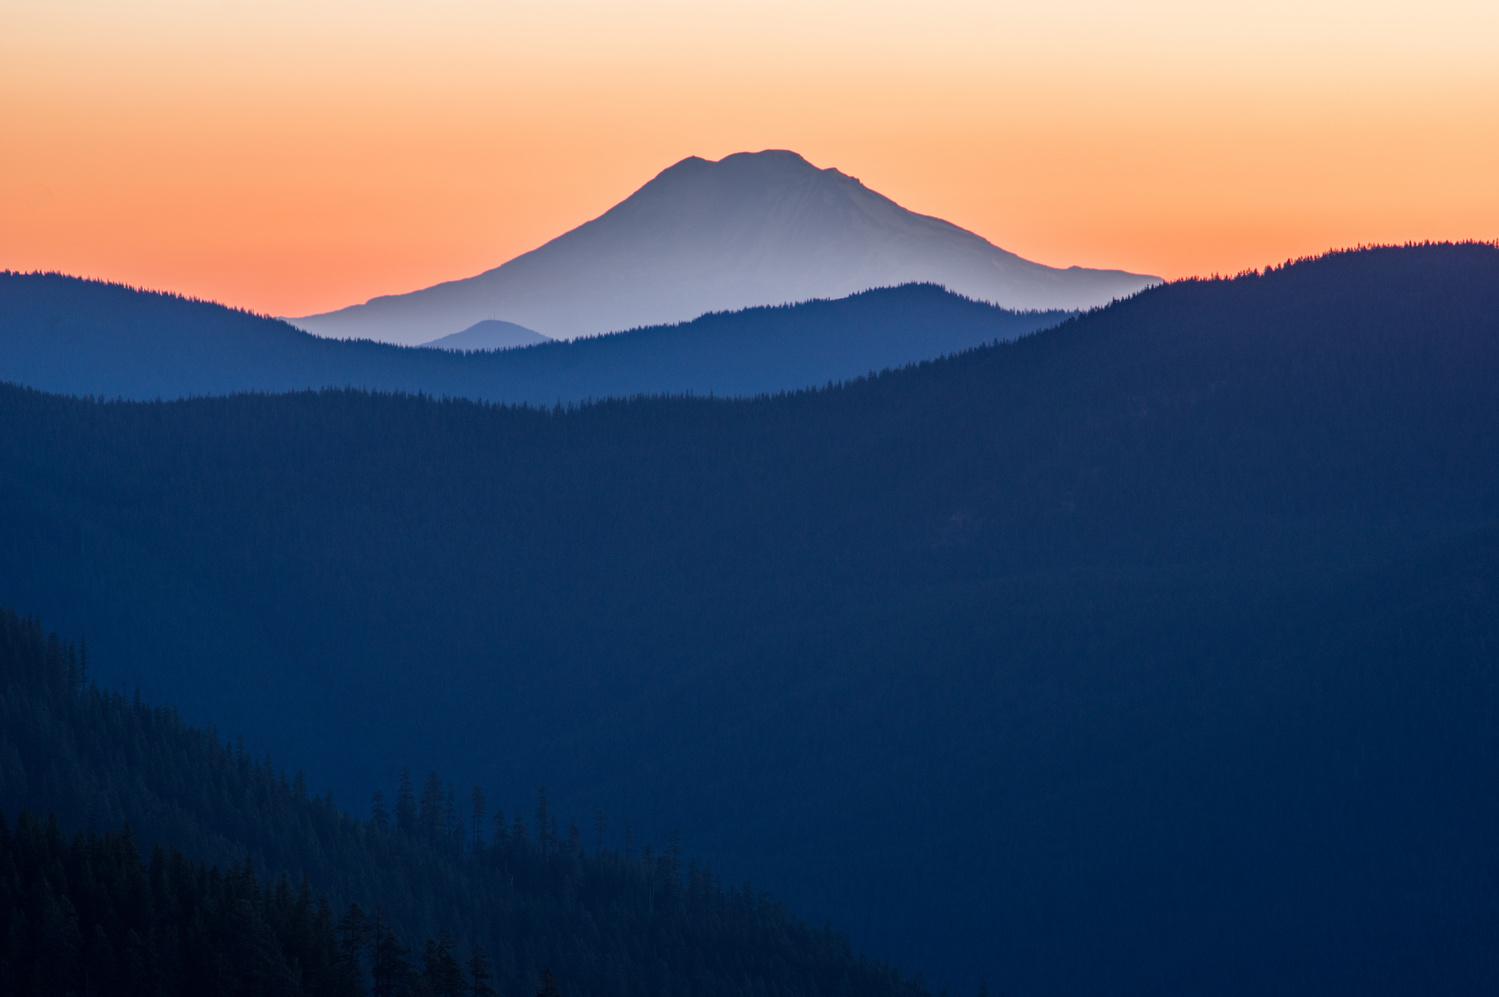 Morning Light by Zach Deets